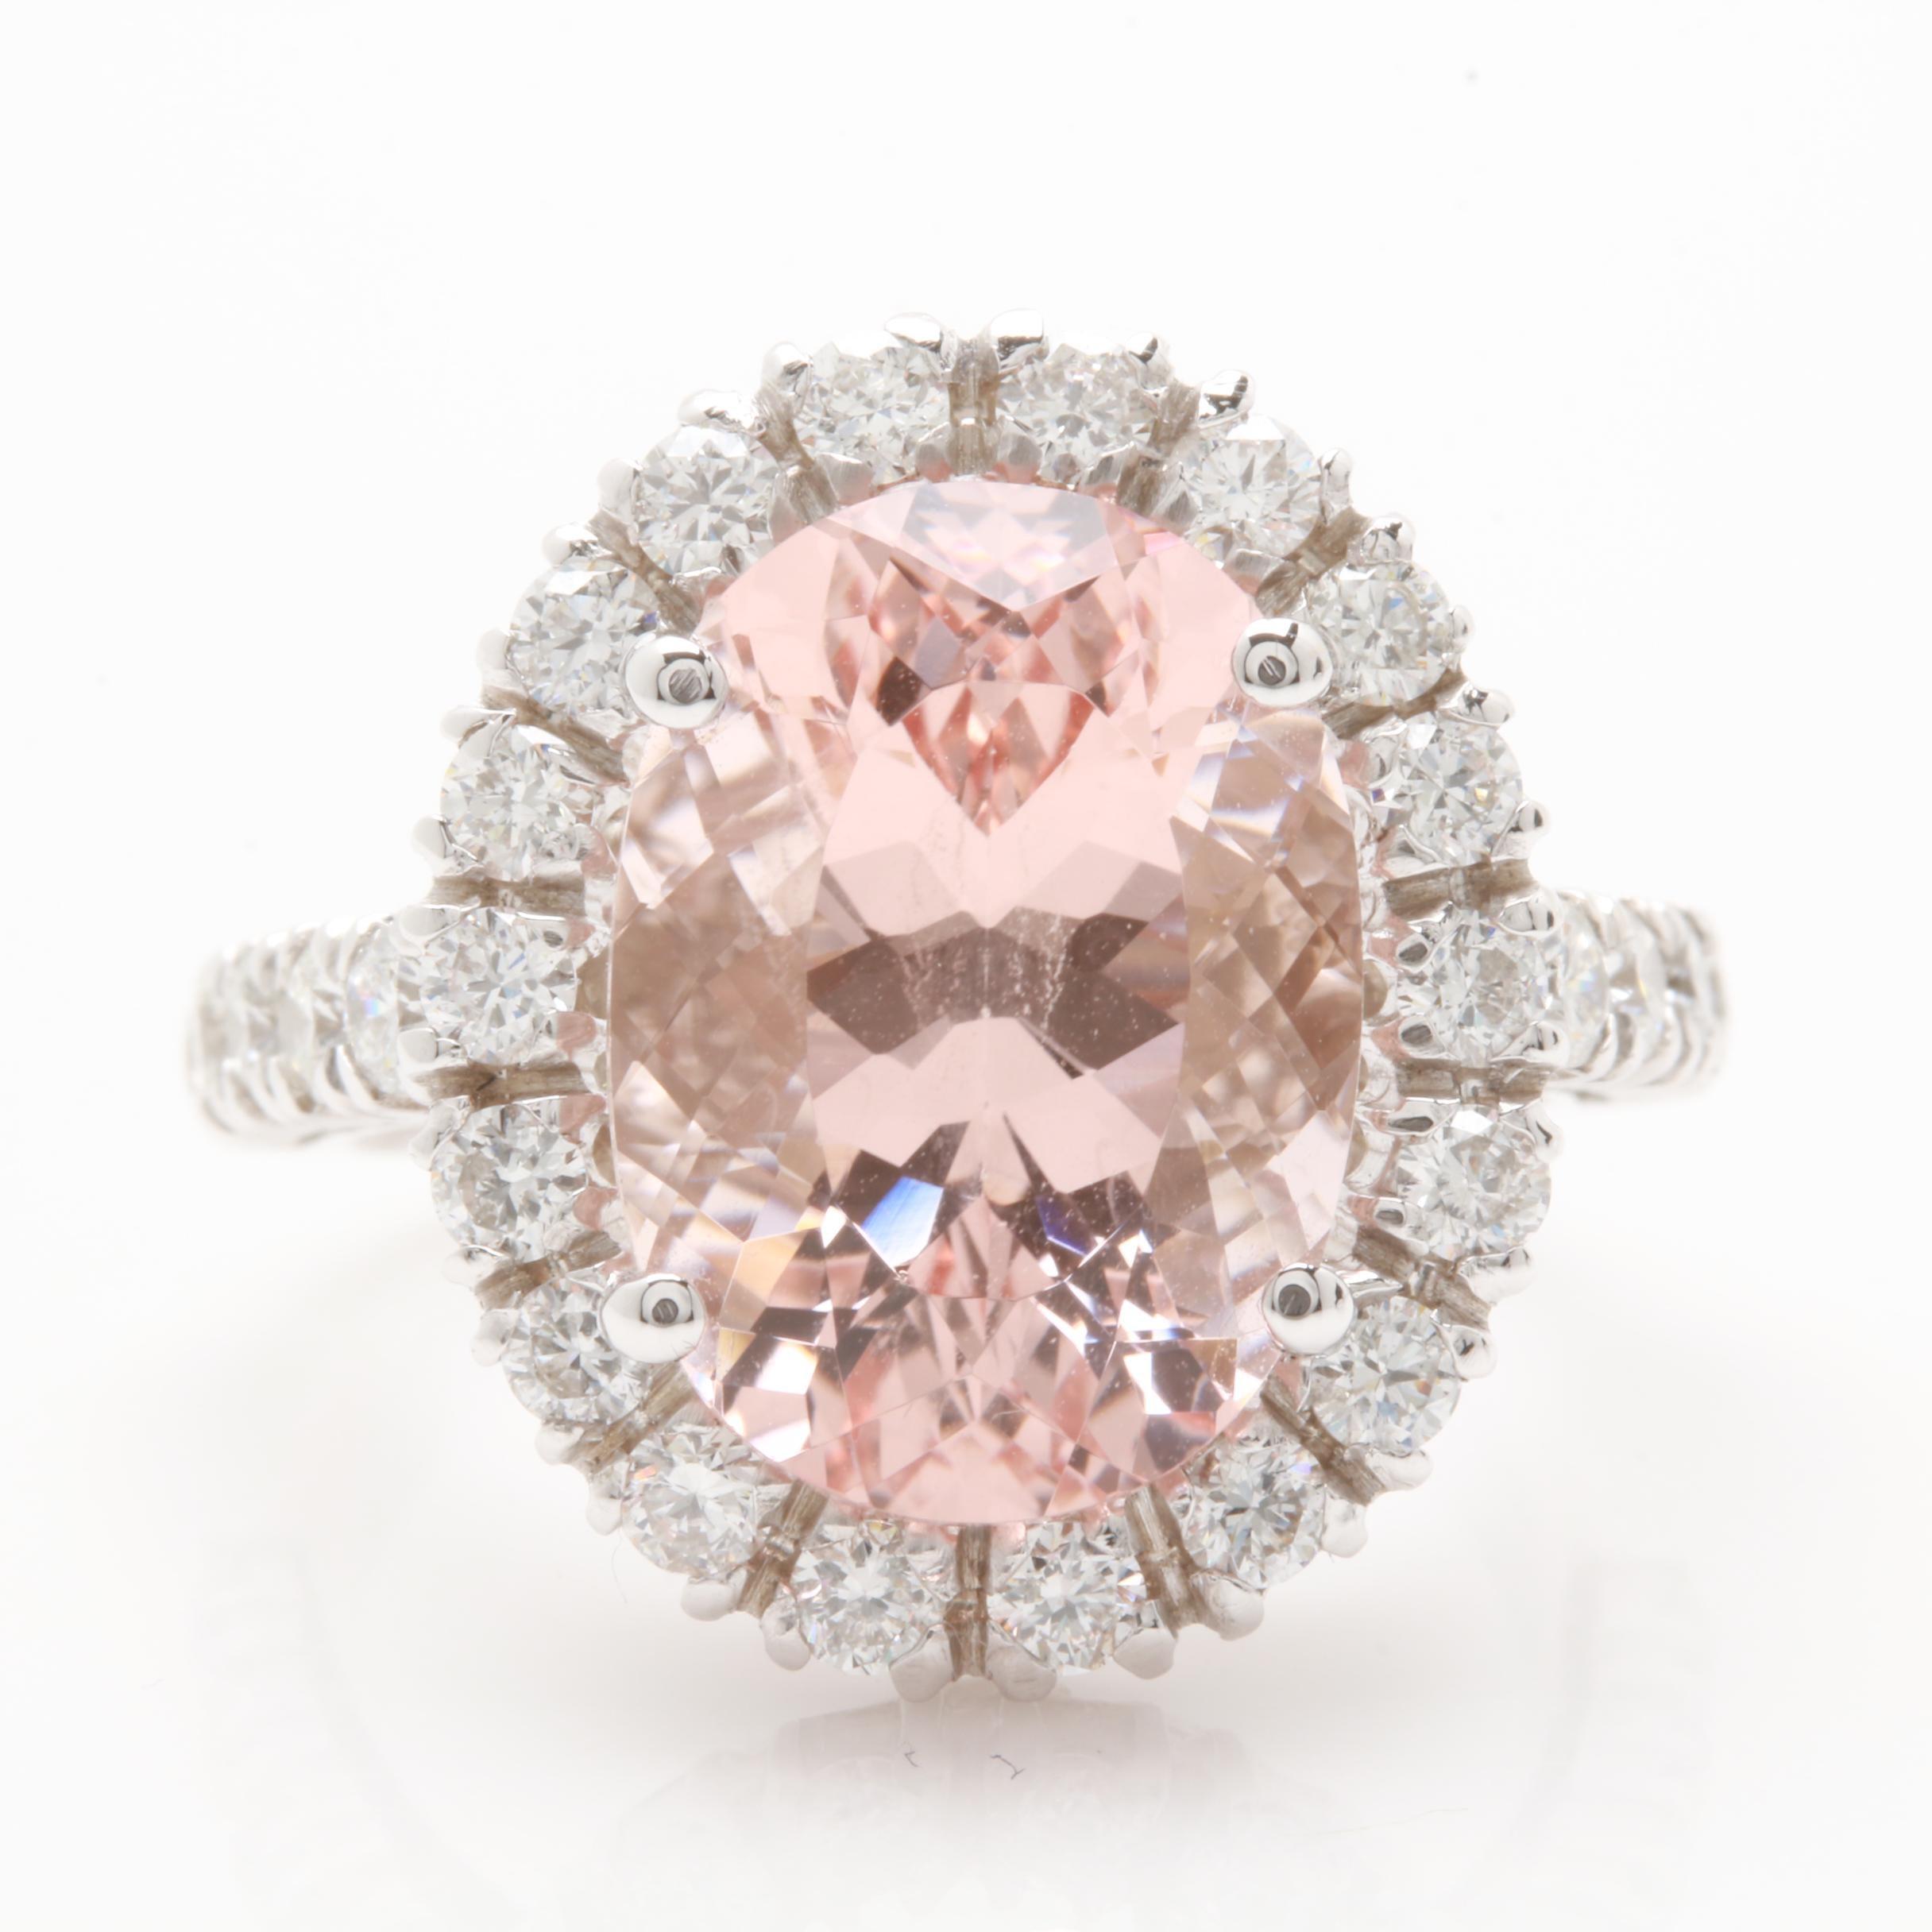 14K White Gold 6.46 CT Morganite and 1.17 CTW Diamond Ring